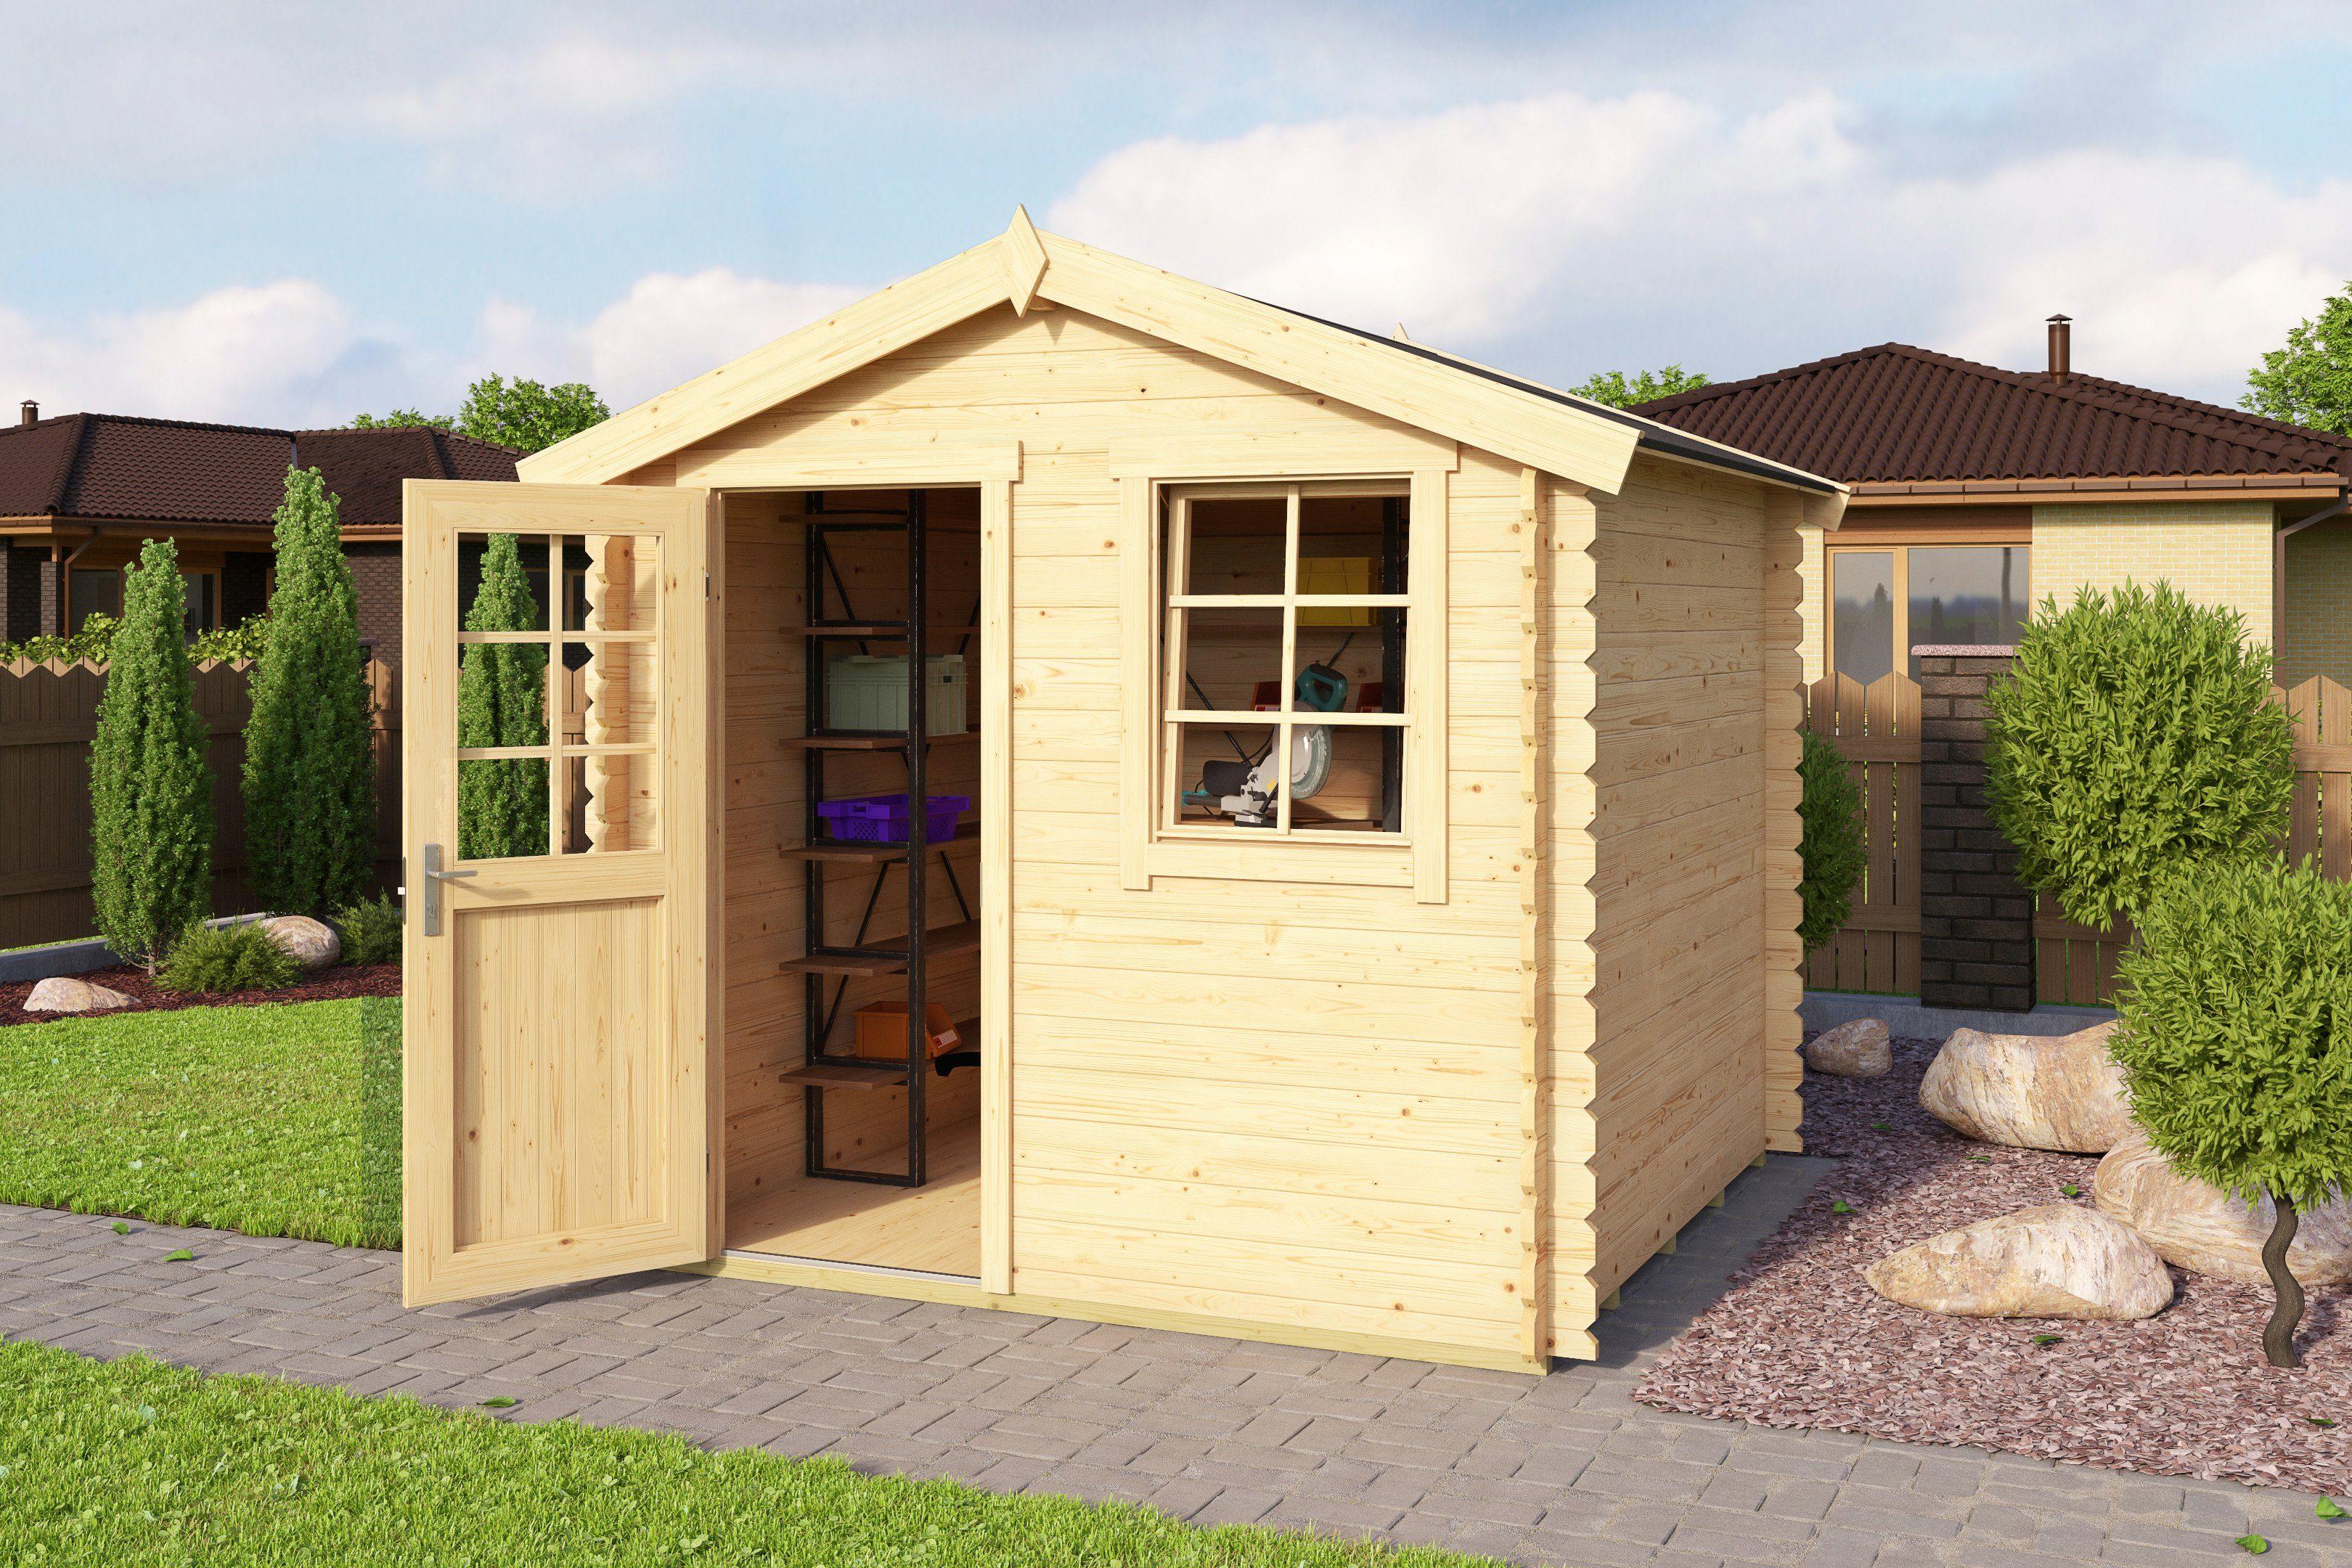 Gartenhaus Outdoor Küche : Gartenhaus baugenehmigung bauweisen material bauen